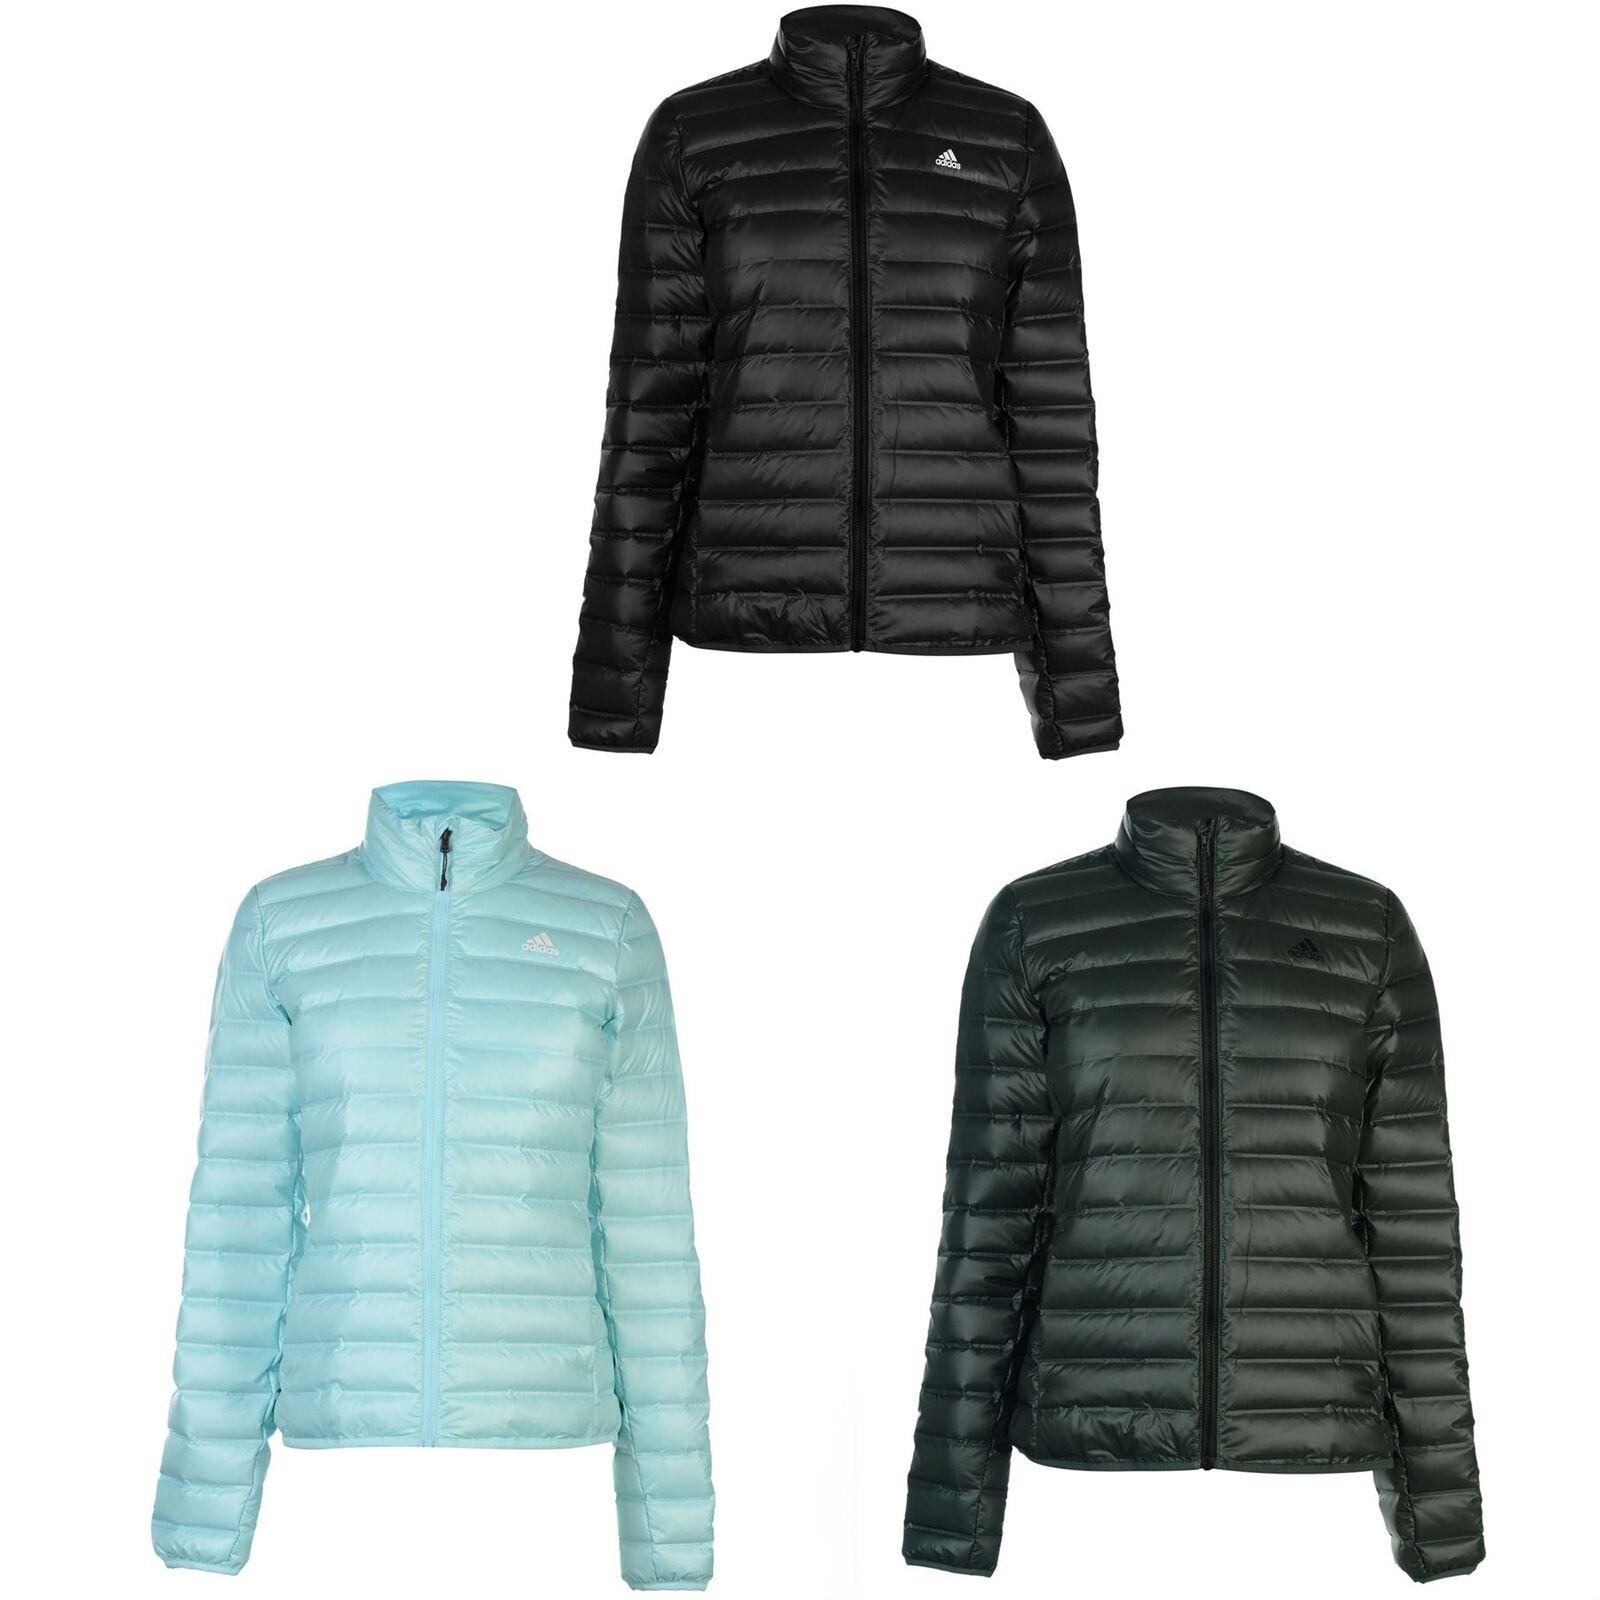 Adidas Varilite Chaqueta para mujer  abrigos abrigos  nuevo sádico